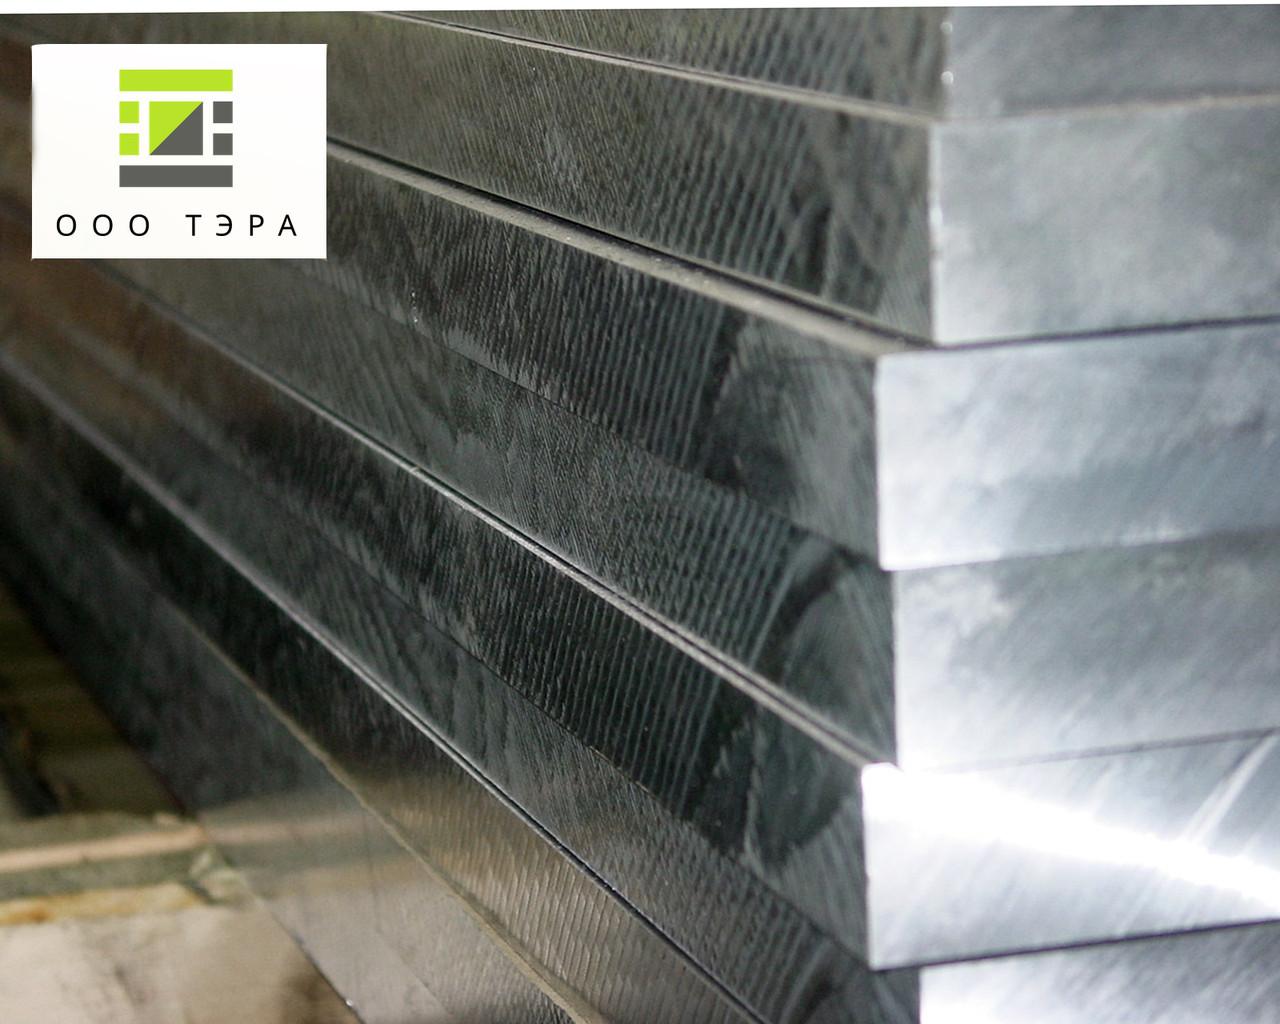 Плита алюминиевая 70 мм АМг6 коррозионностойкий сплав.